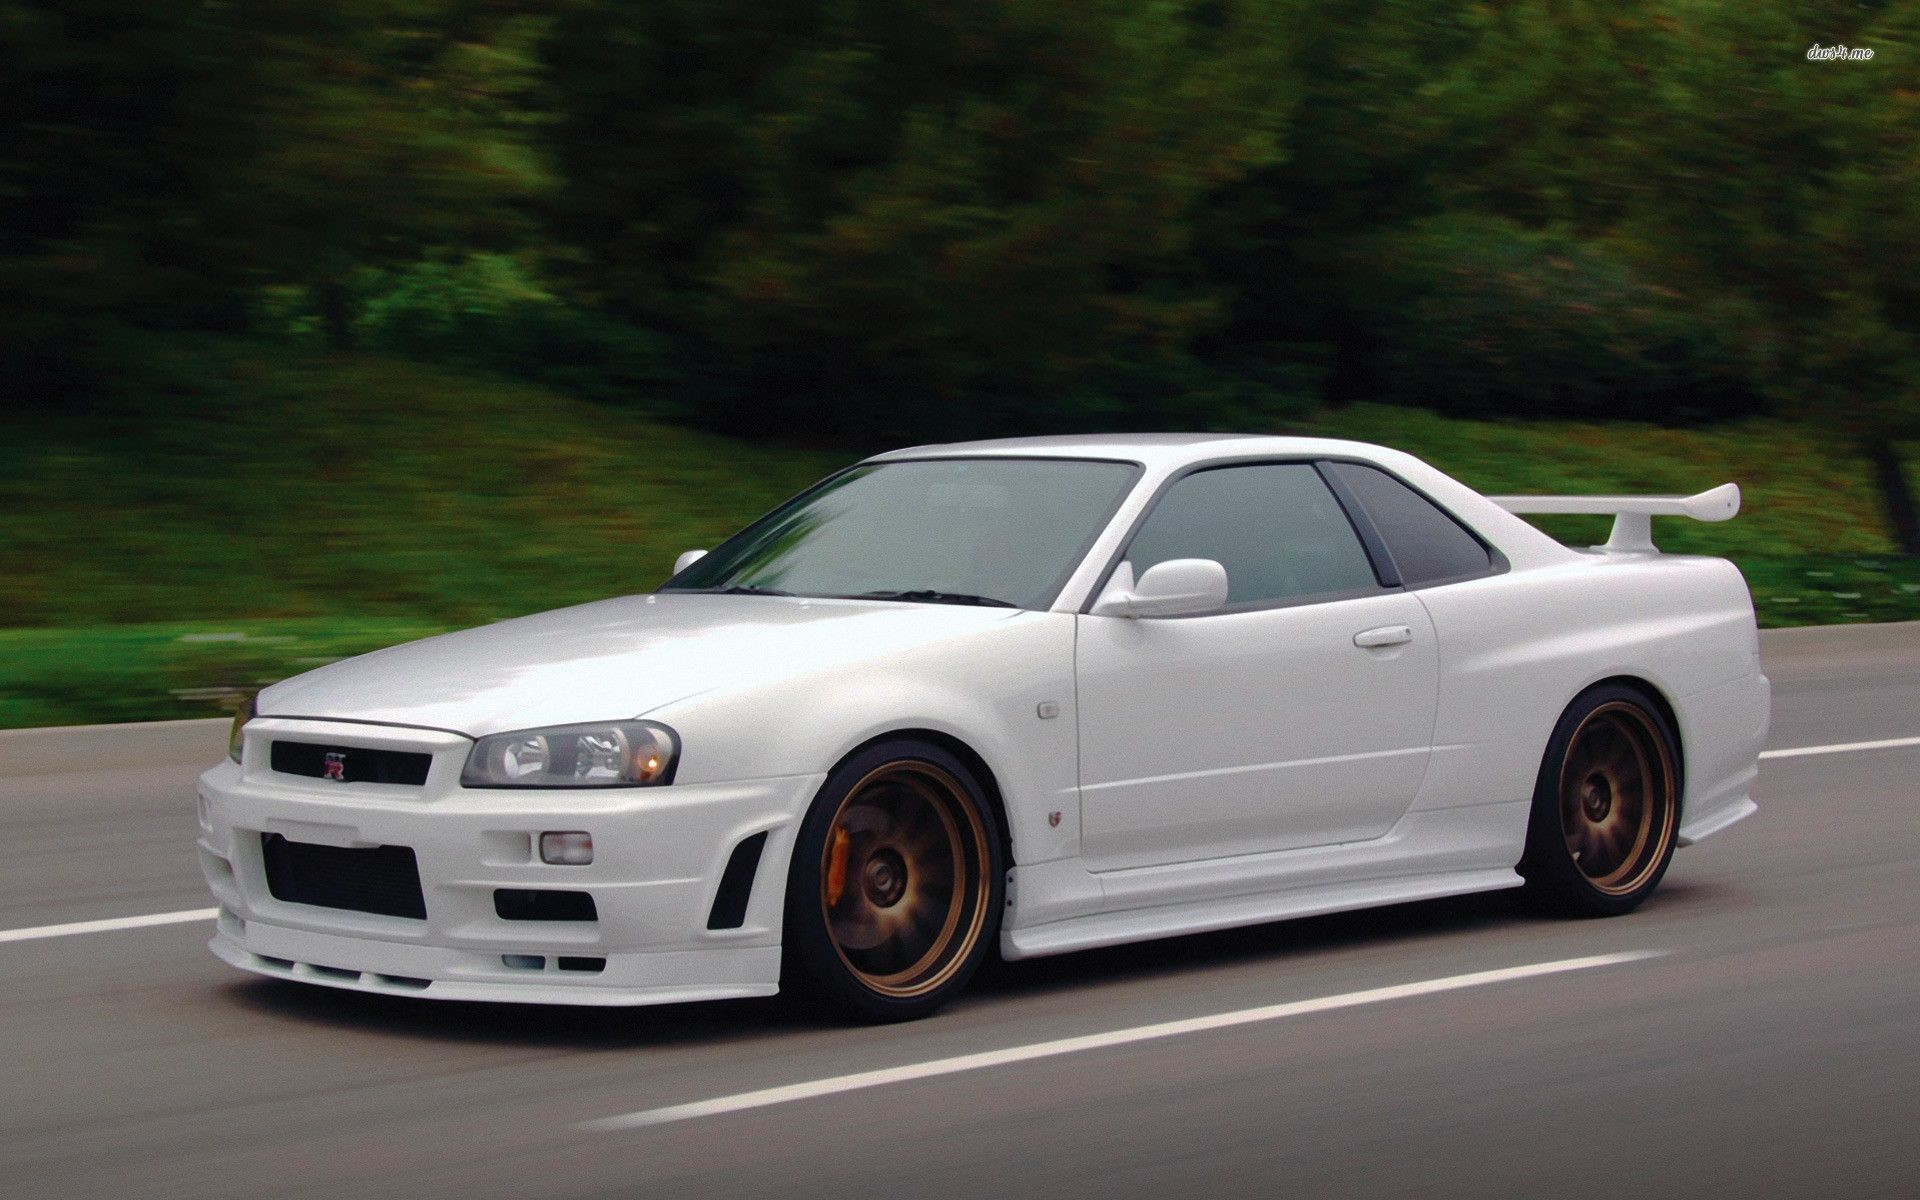 Nissan Skyline GT-R Car HD desktop wallpaper, Nissan wallpaper, Nissan GT-R  wallpaper – Cars no.